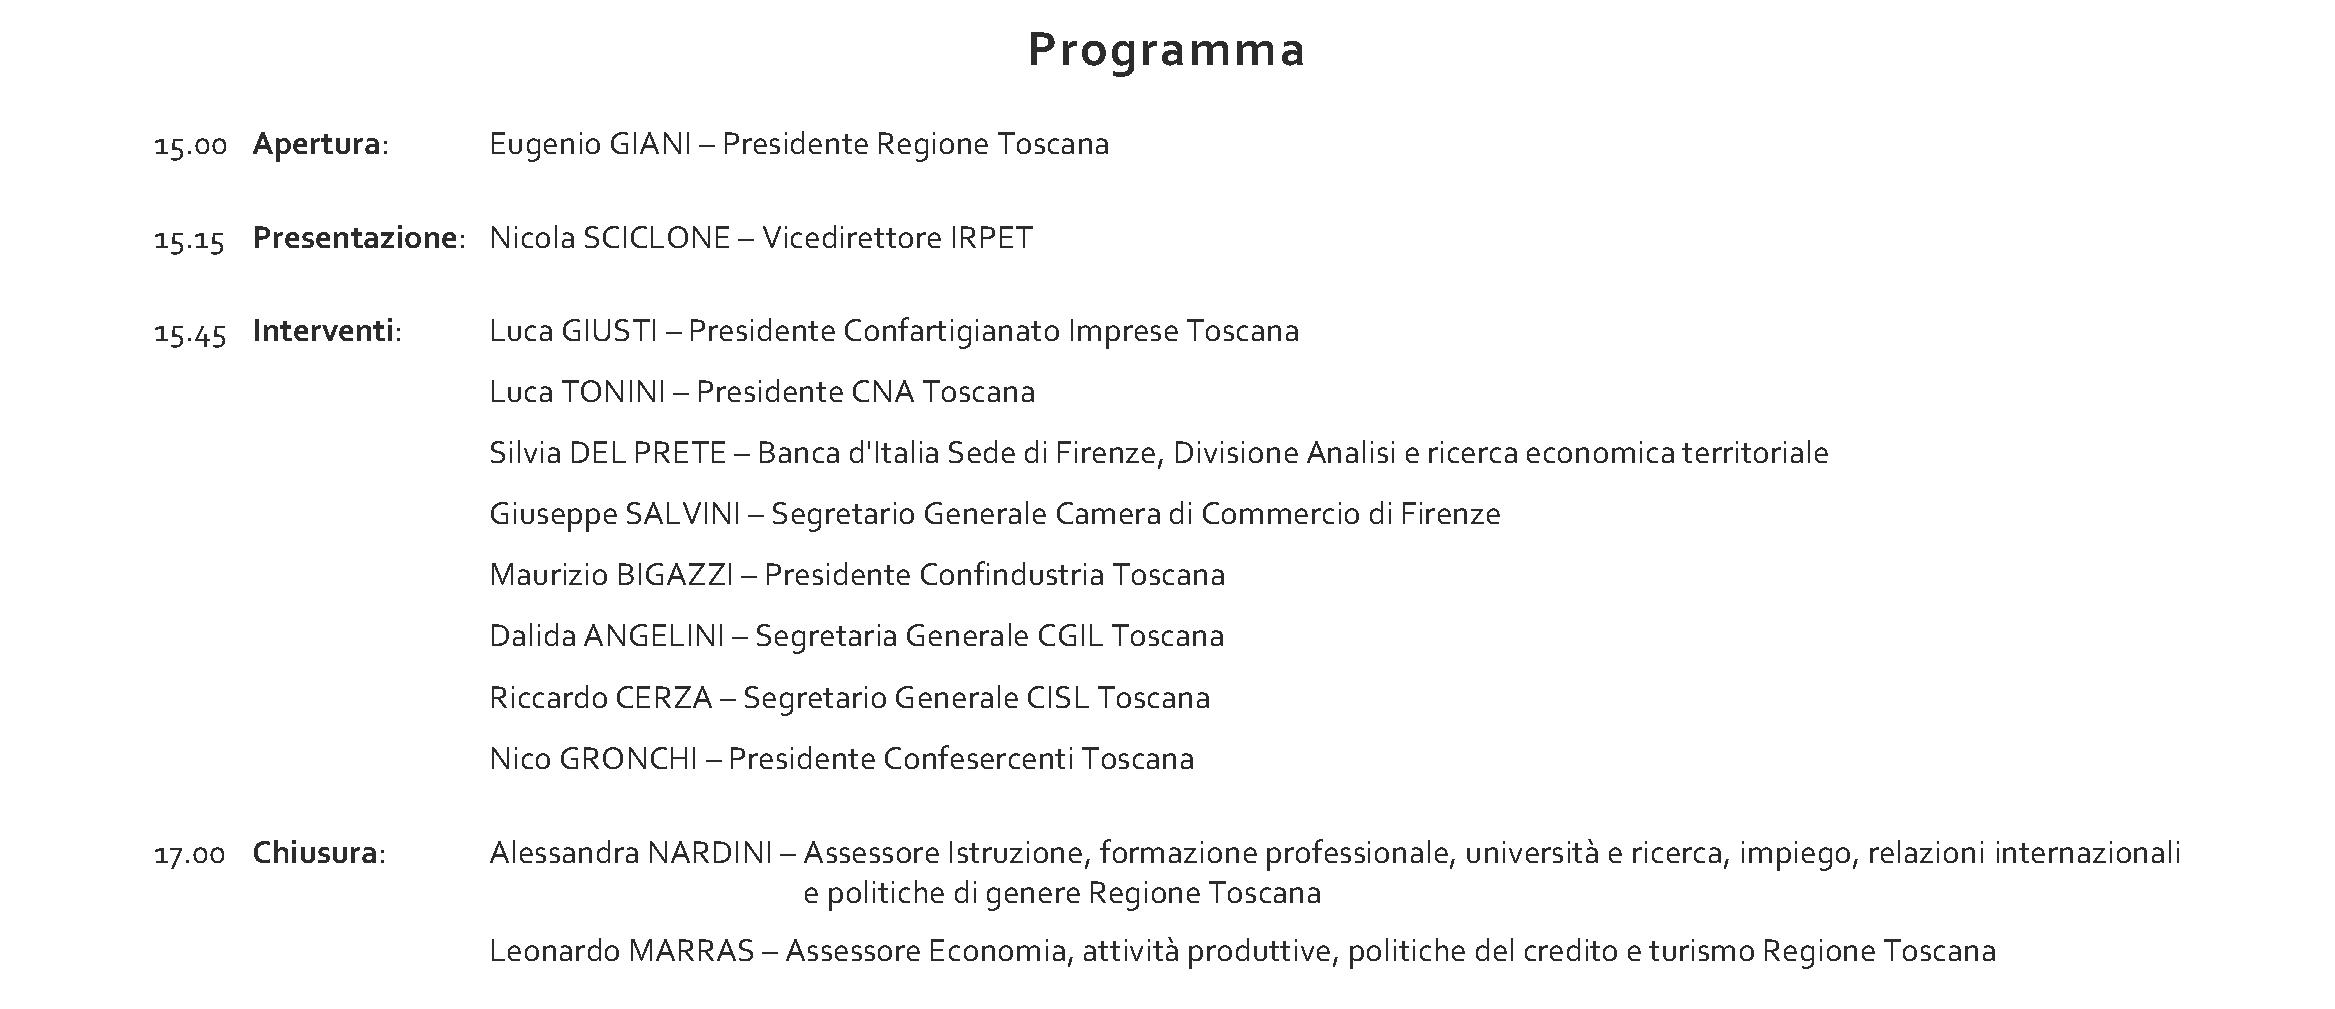 Programma IRPET 28.04.2021 15.00